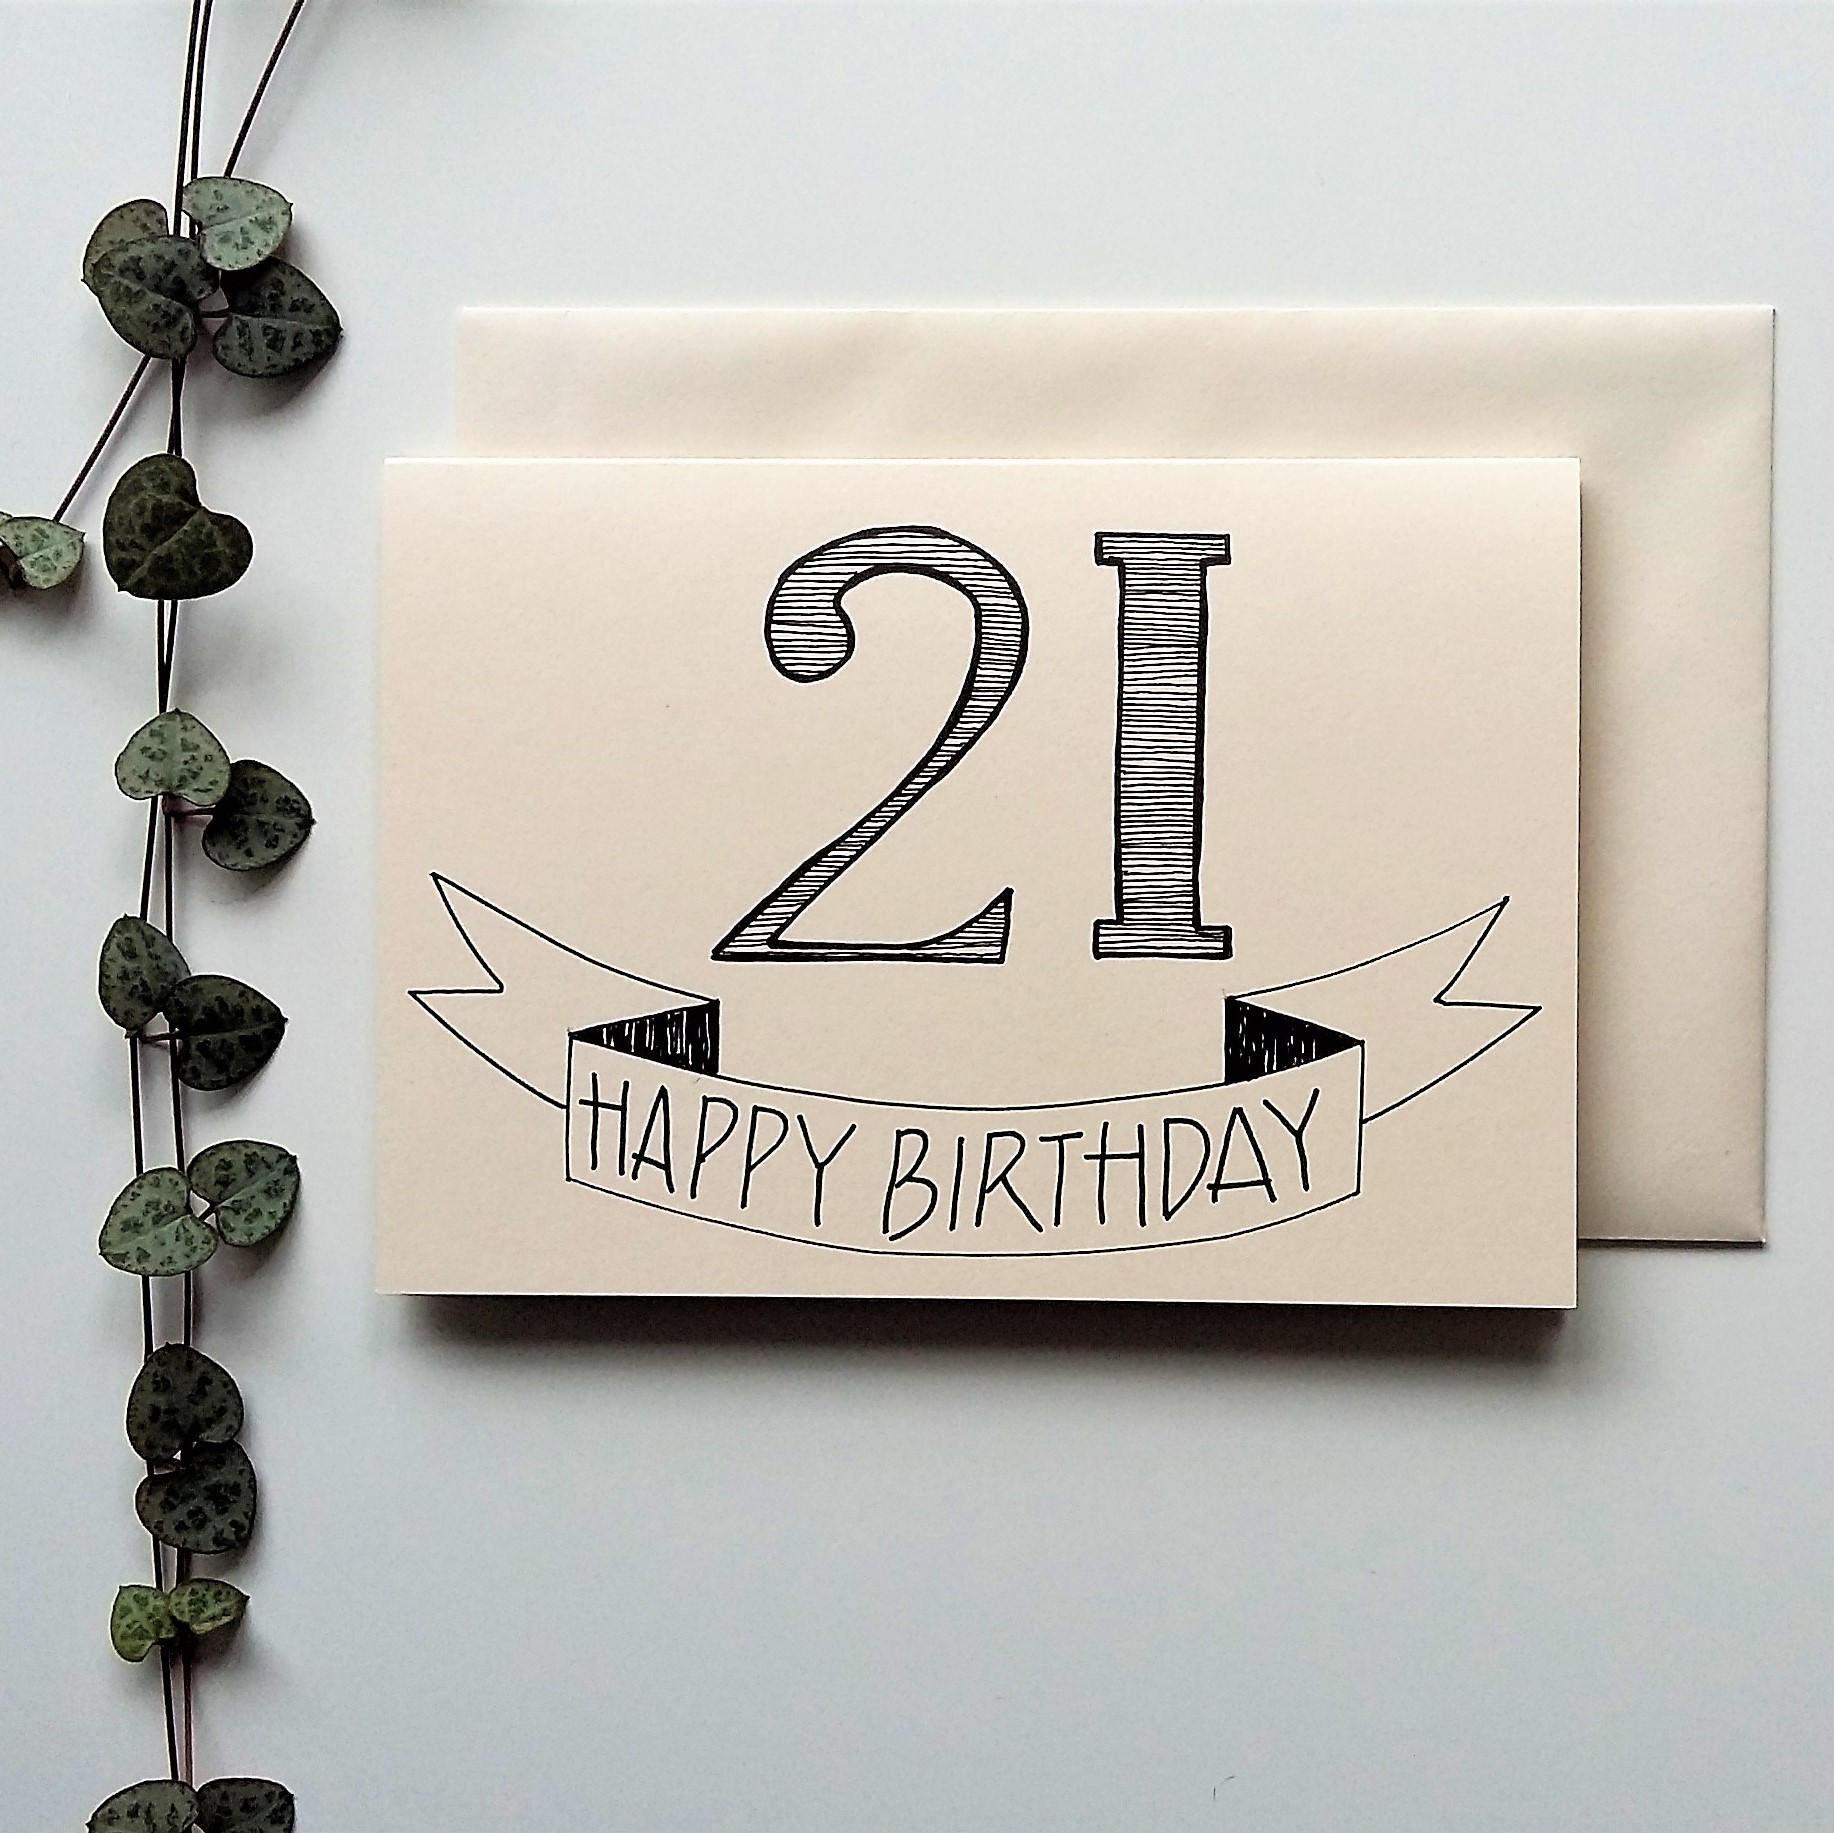 21st birthday card a6 hand drawn birthday card bookmarktalkfo Gallery